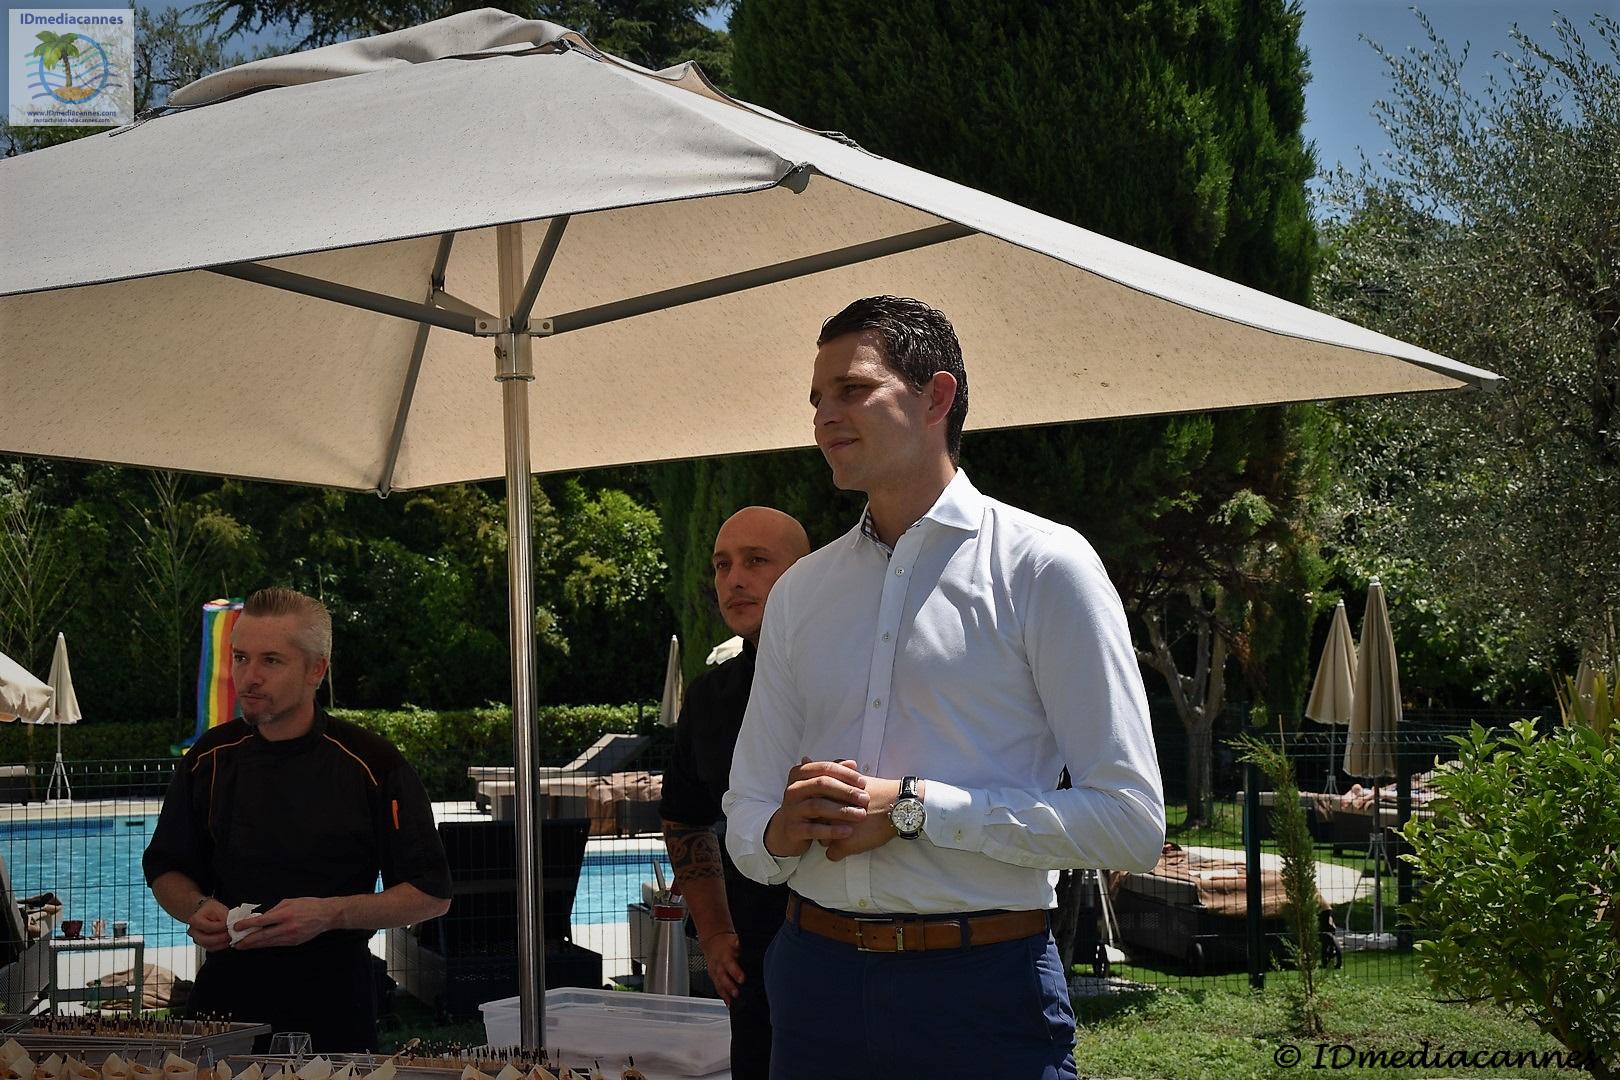 Basile arnaud le jardin idmediacannes for Le jardin mougins